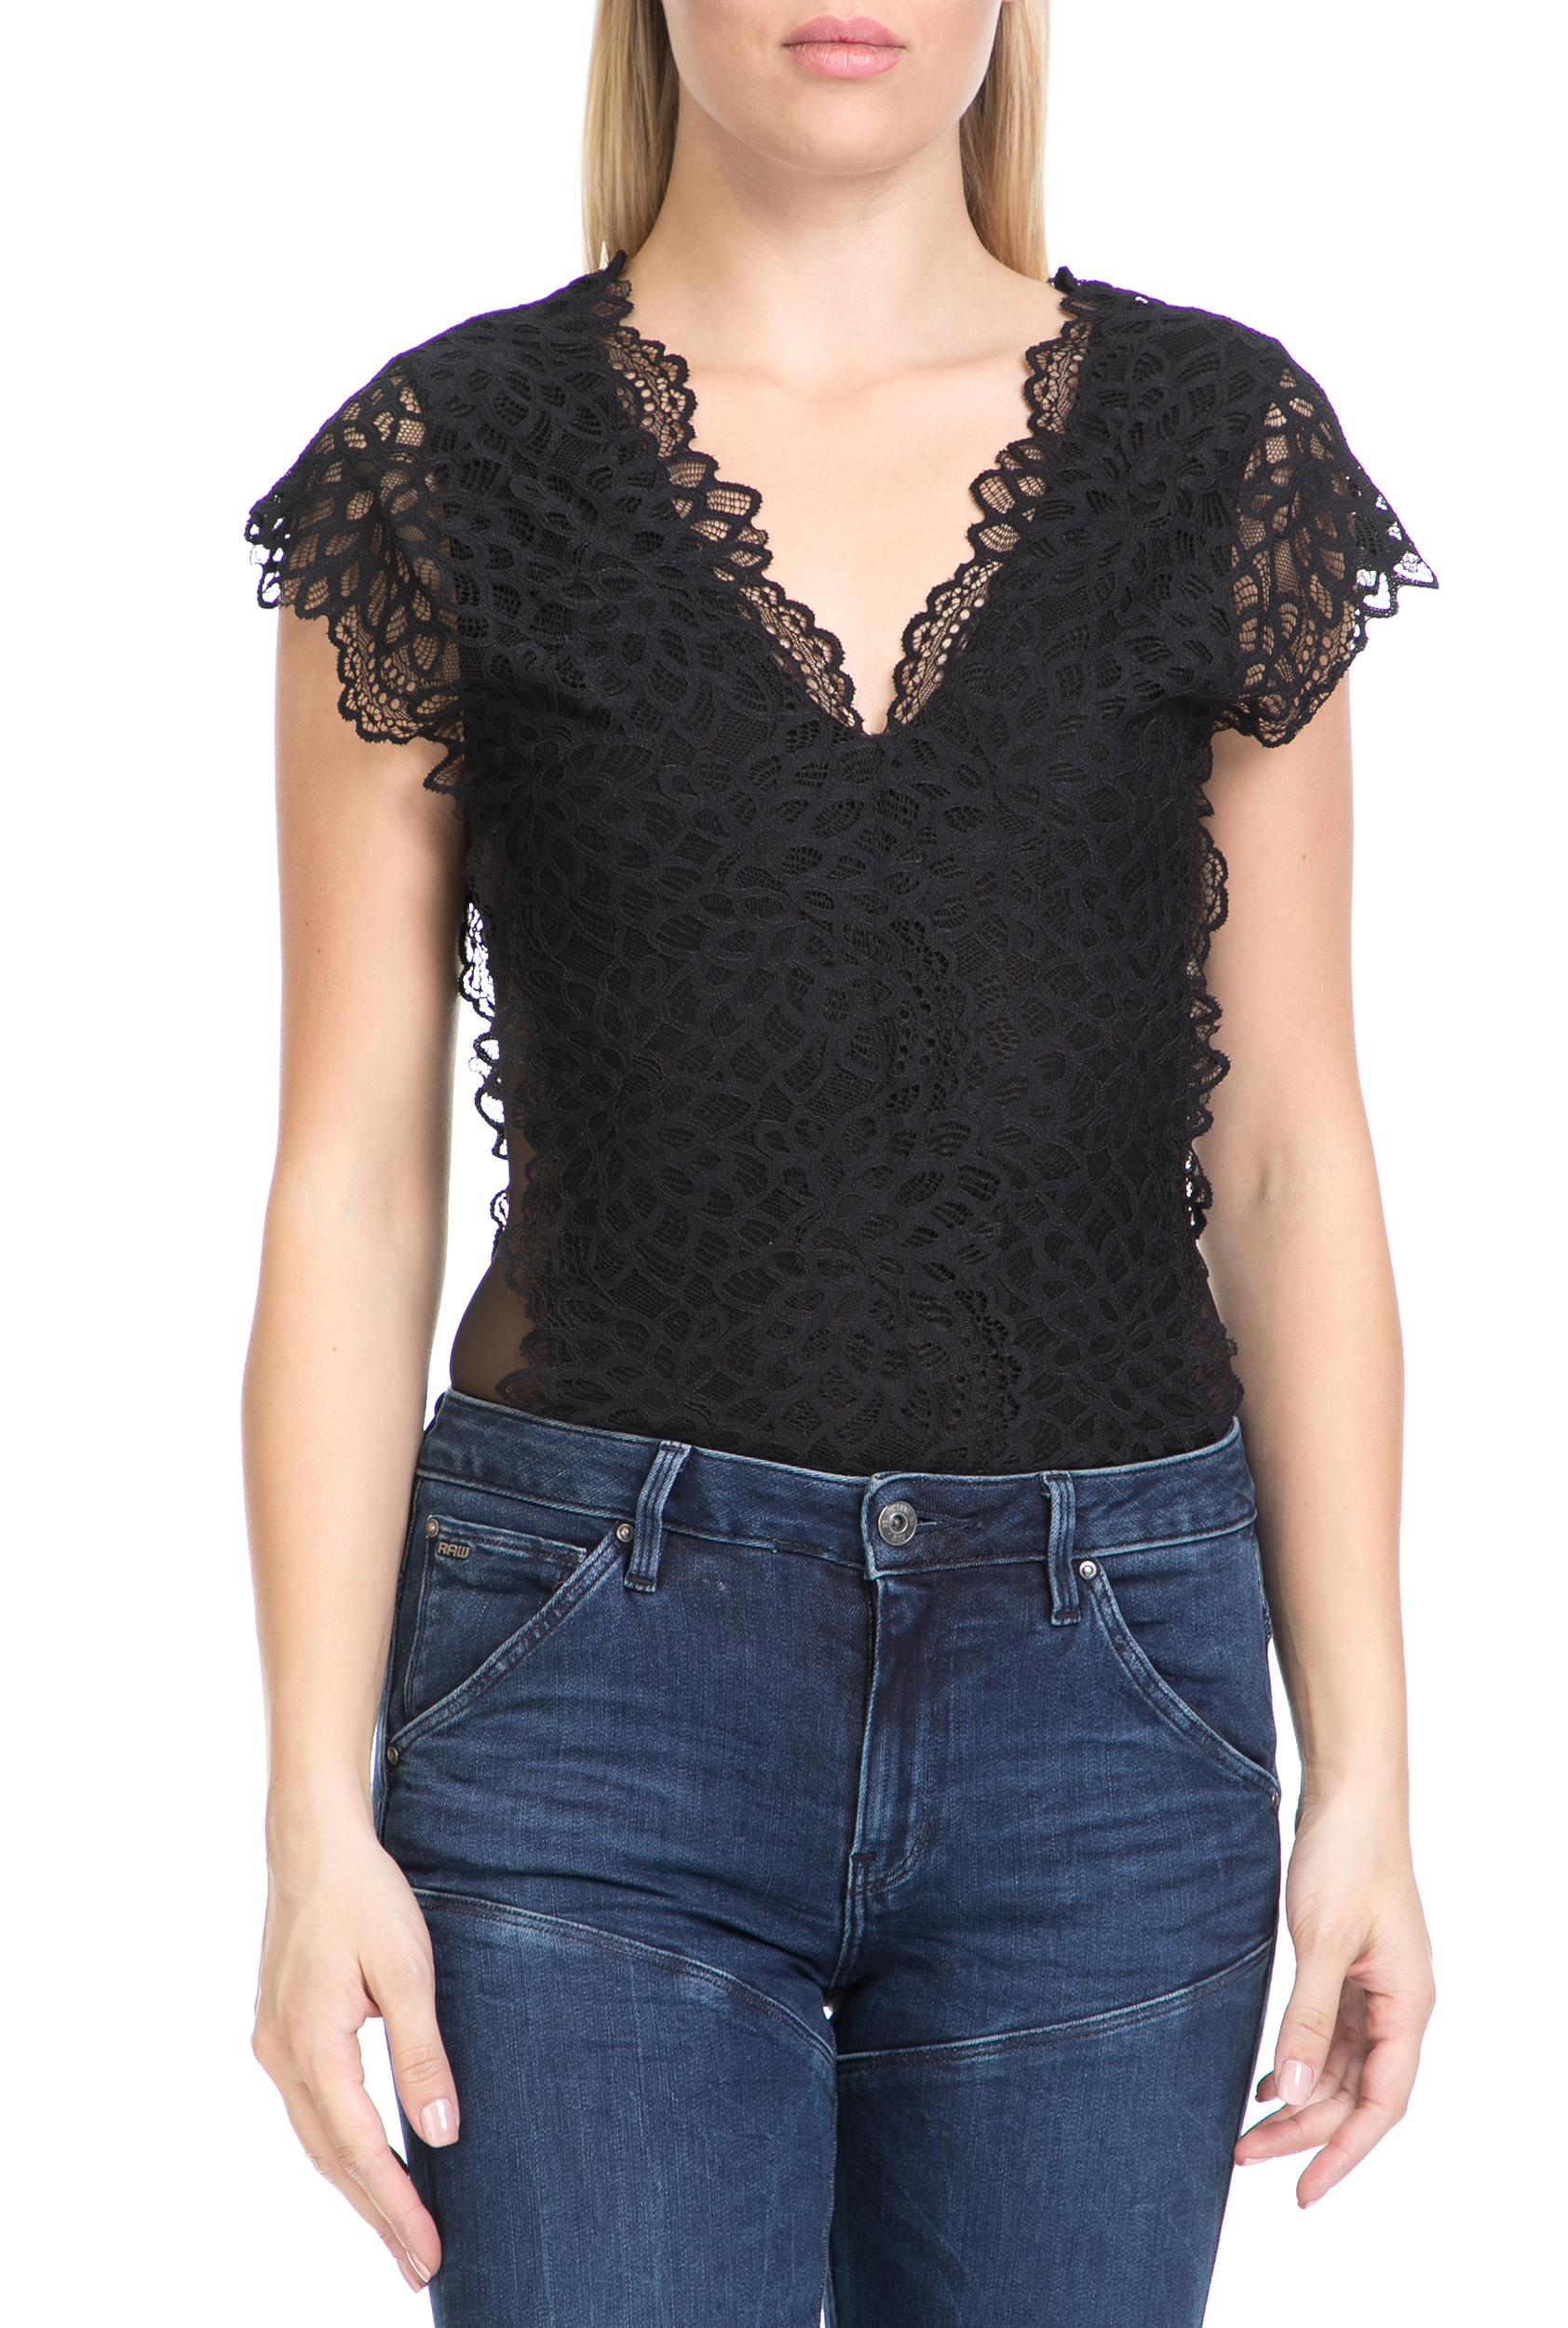 GUESS - Γυναικείο body VANIA GUESS μαύρο γυναικεία ρούχα εσώρουχα κορμάκια